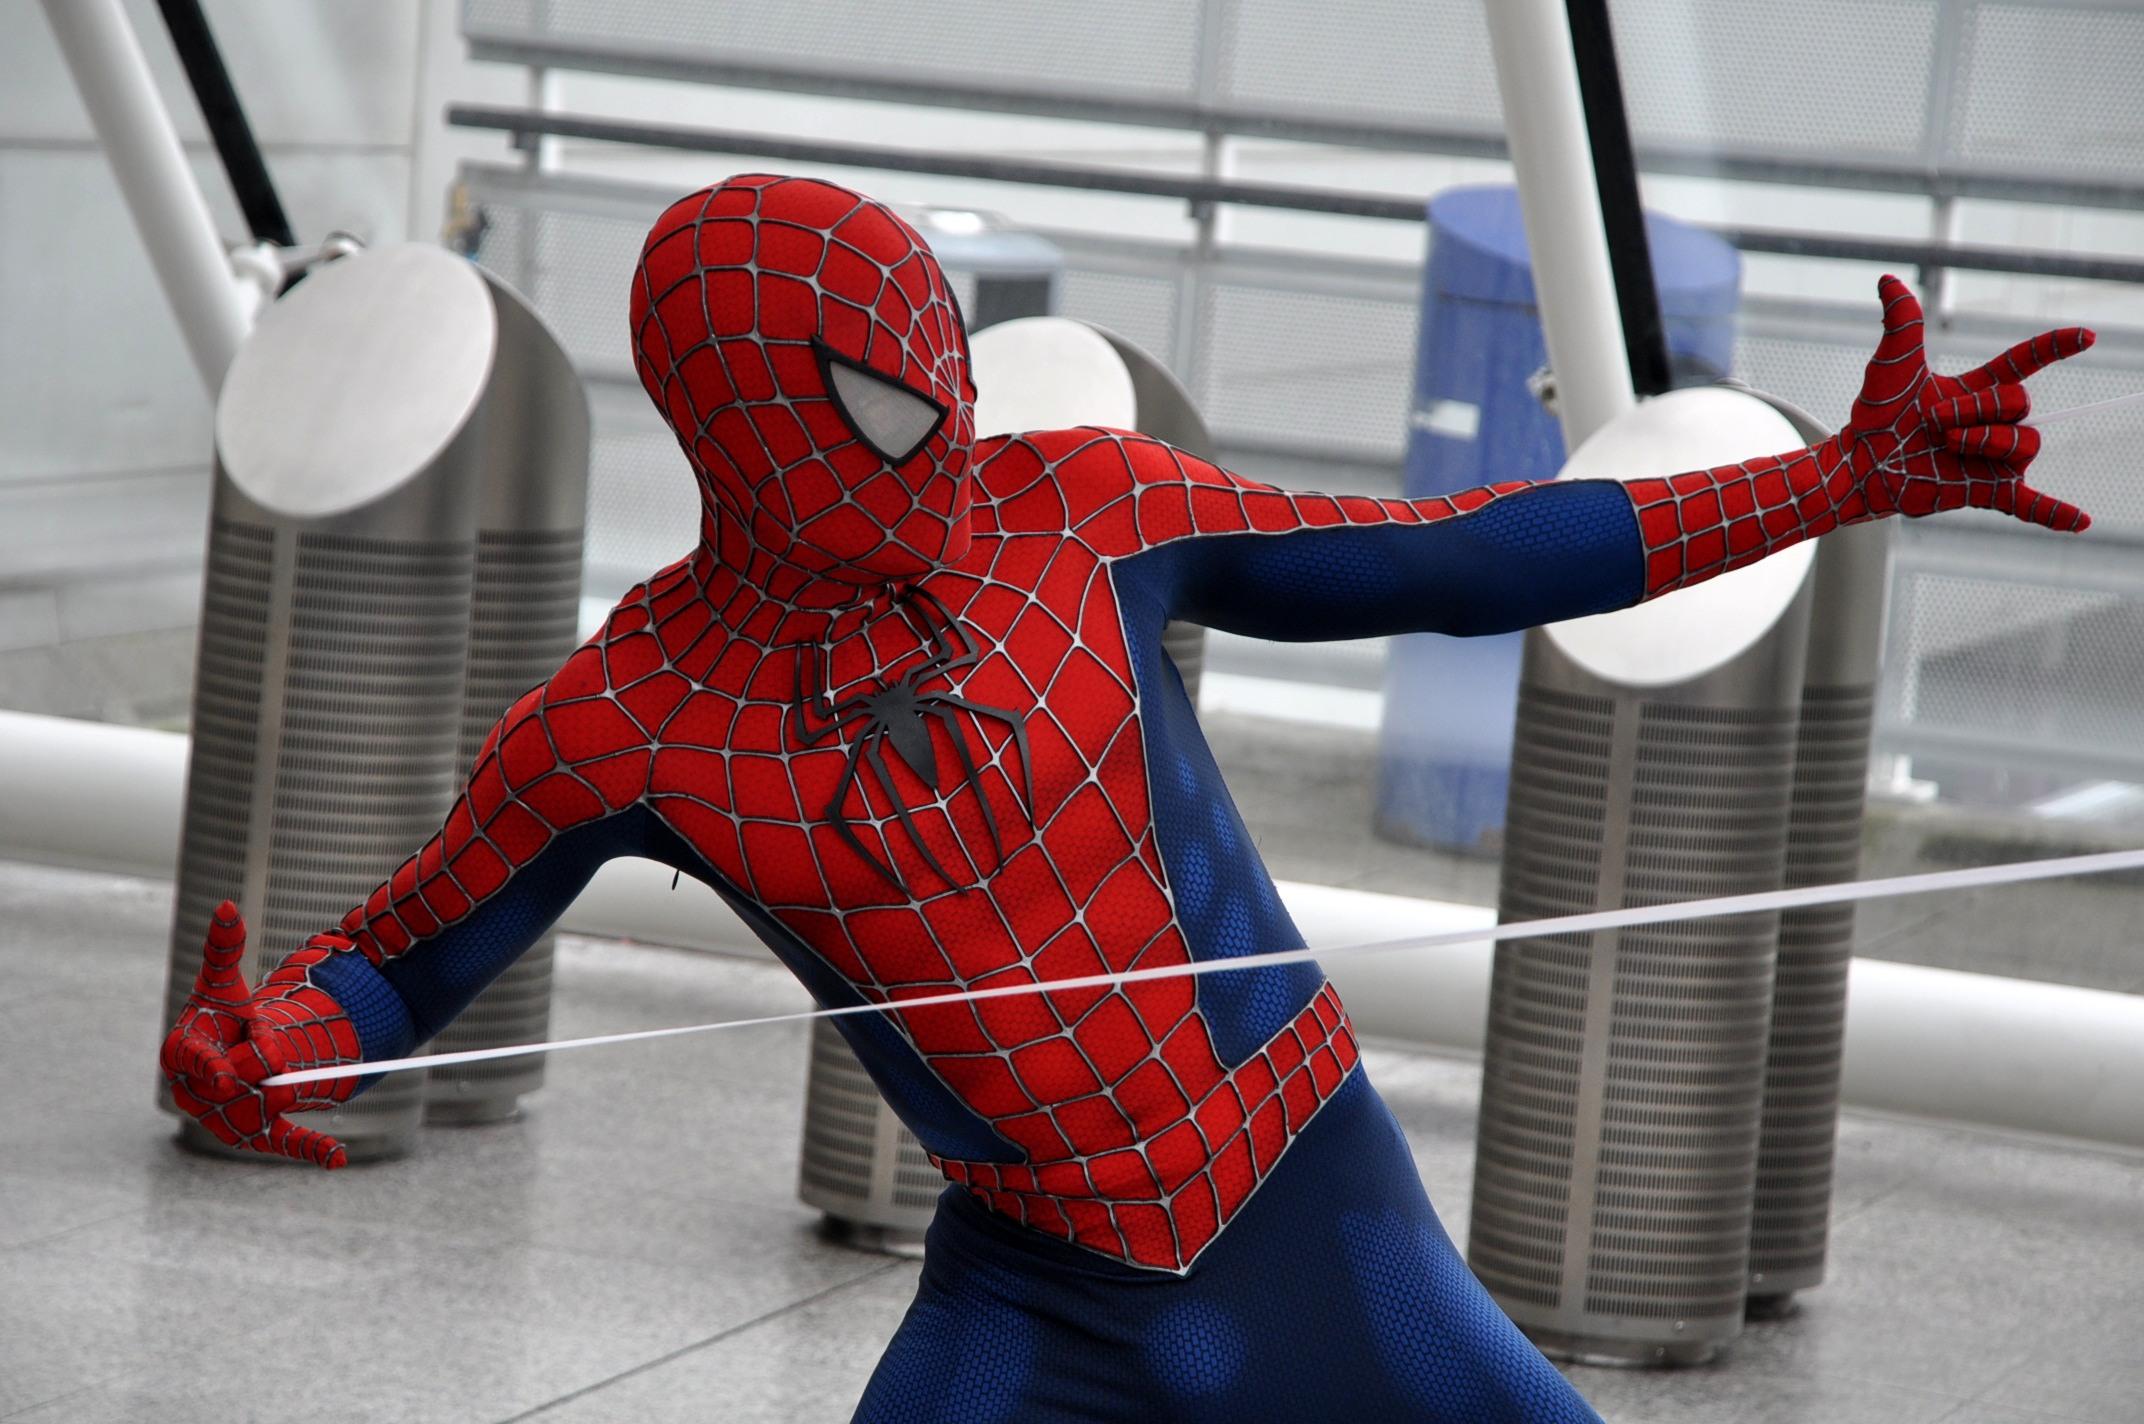 Spiderman hand shooting web